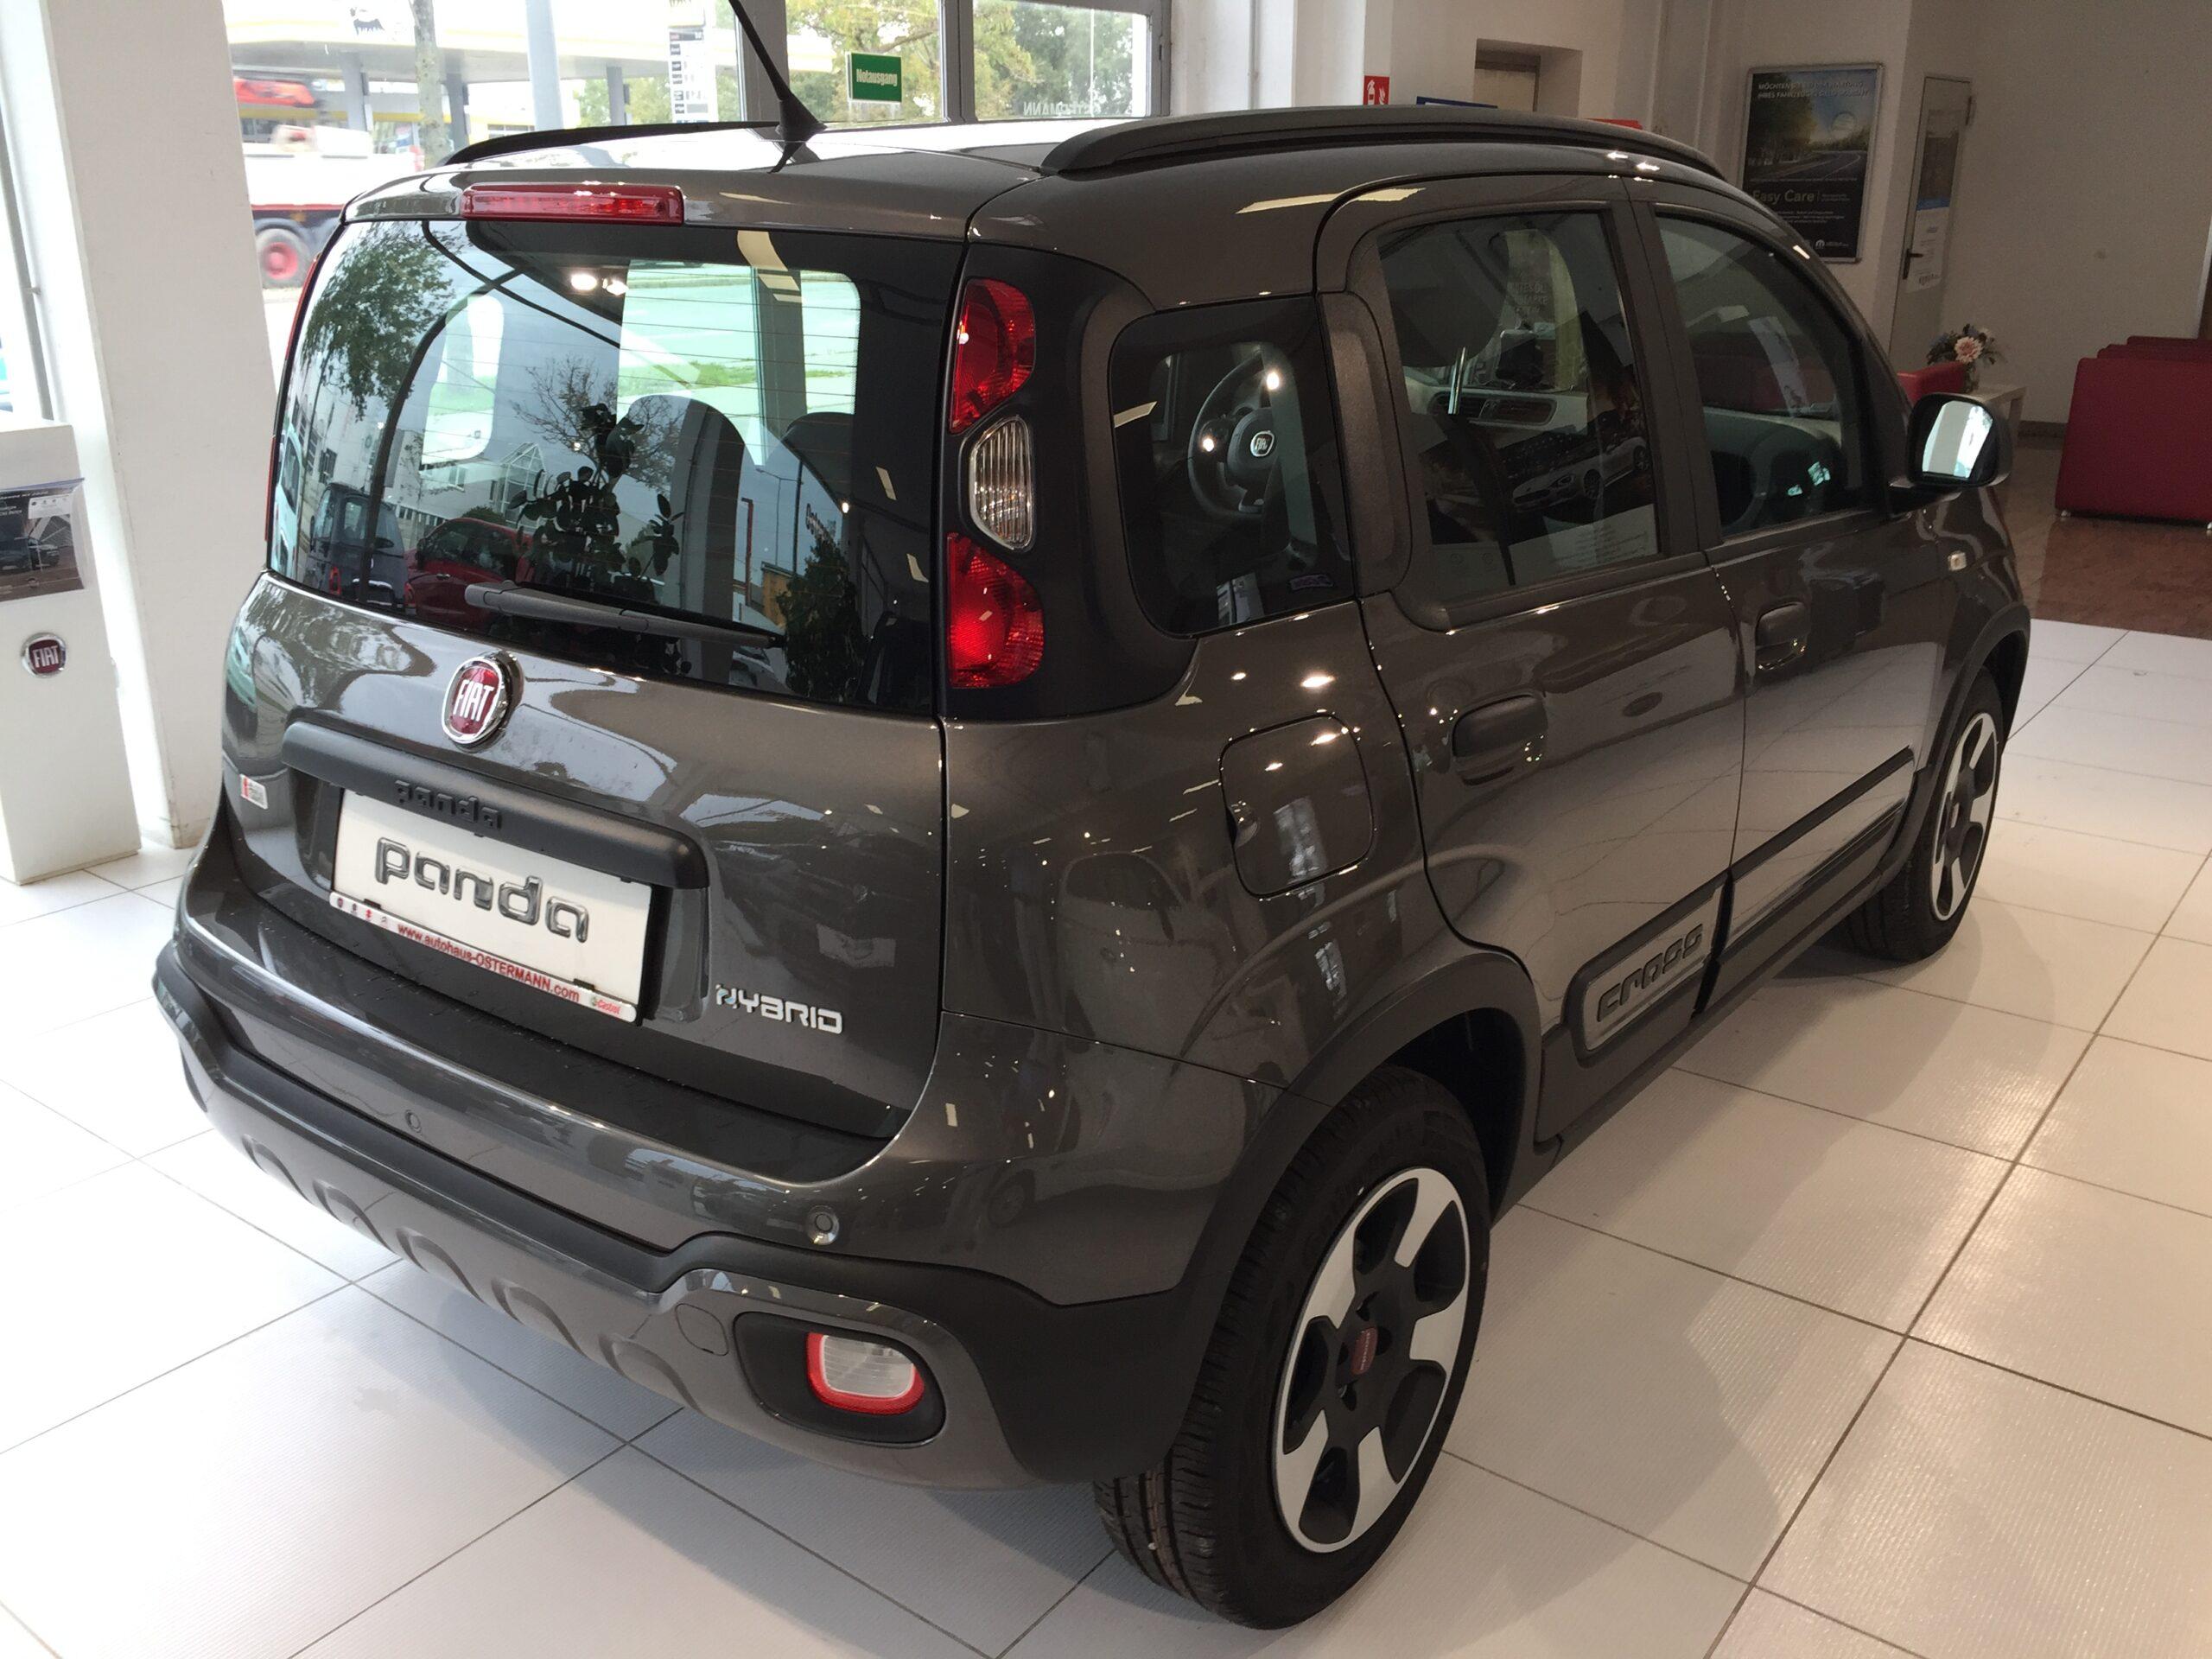 Fiat Panda 1.0 FireFly Hybrid 70 City Cross, NEUWAGEN full